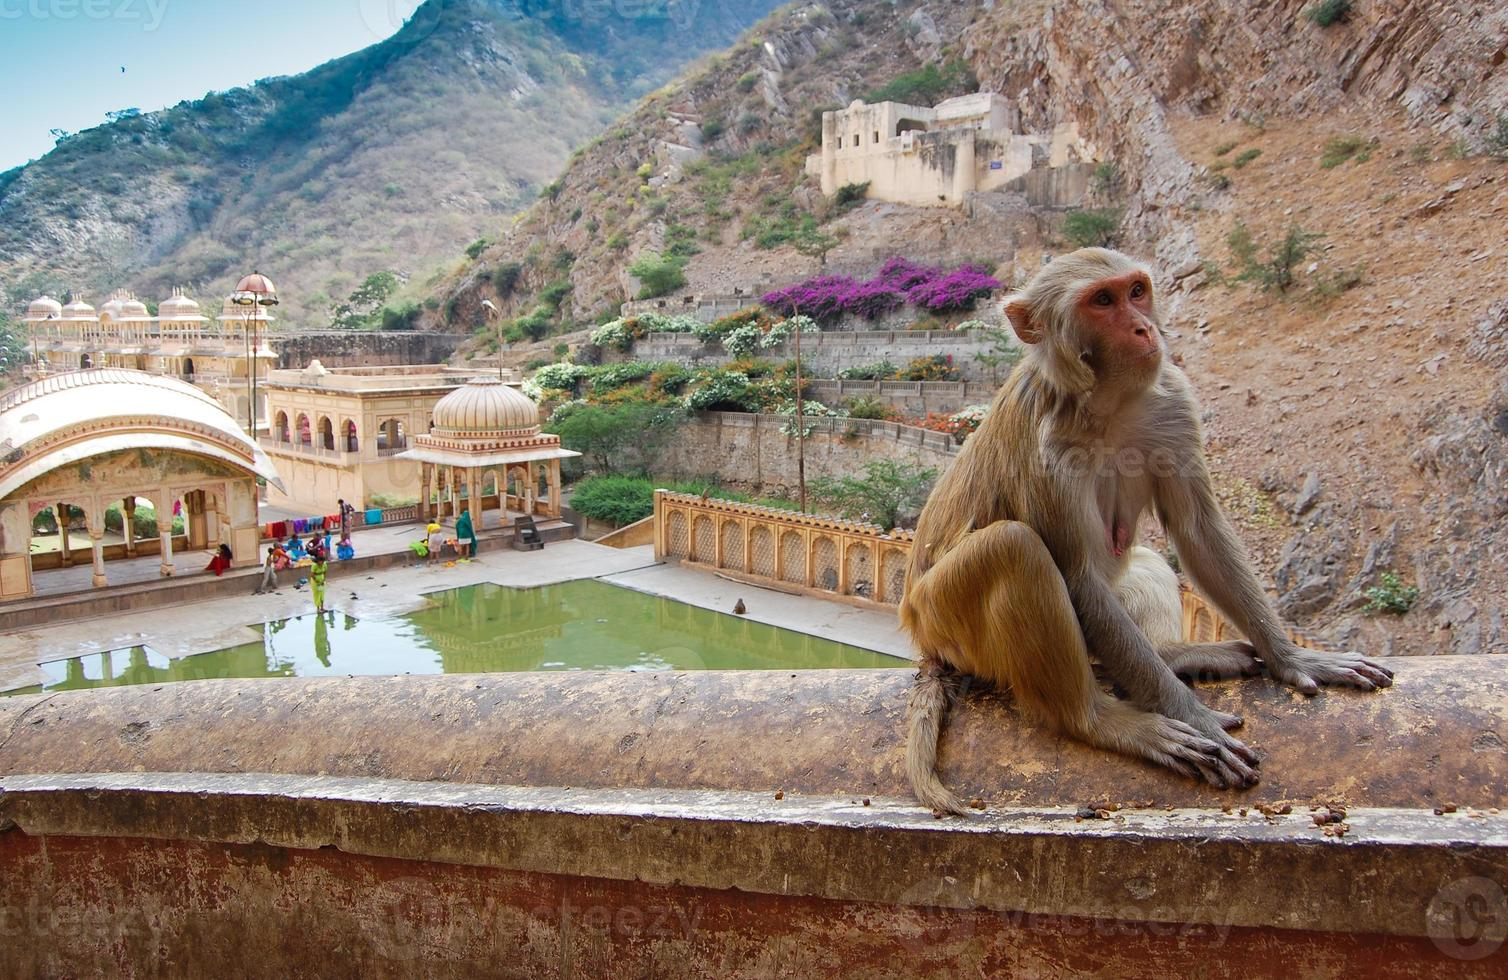 templo do macaco nas proximidades de jaipur, na índia. foto